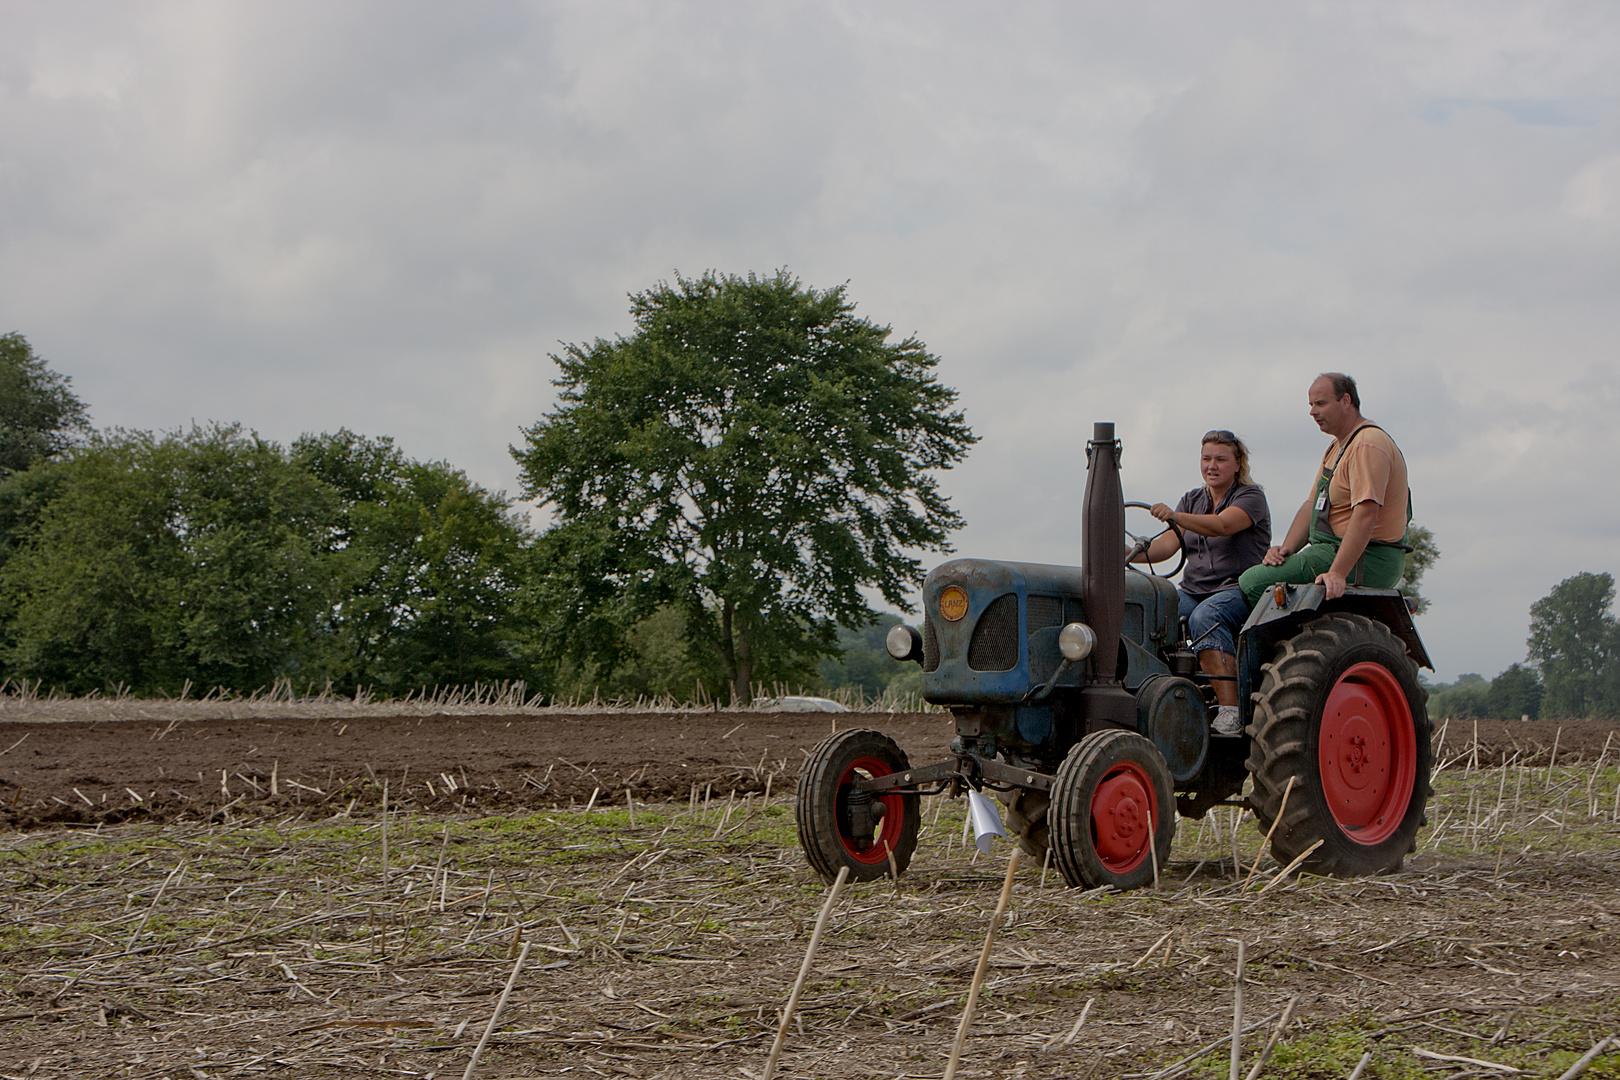 Resi holt ihn mit dem Traktor ab ...